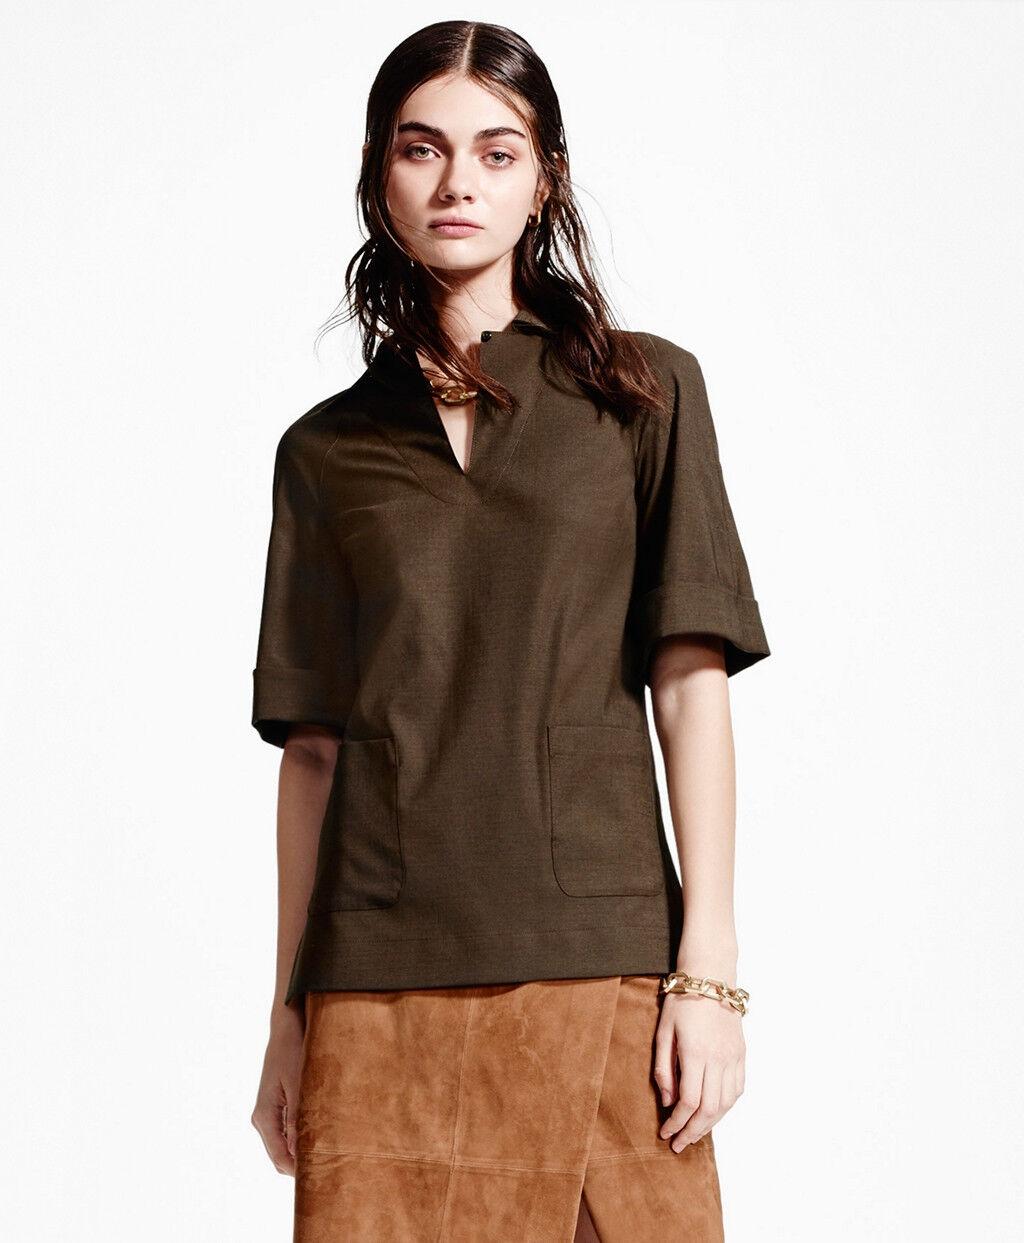 NEW Brooks Brothers 14 braun Stretch Wool Tunic Shirt Top w Pockets